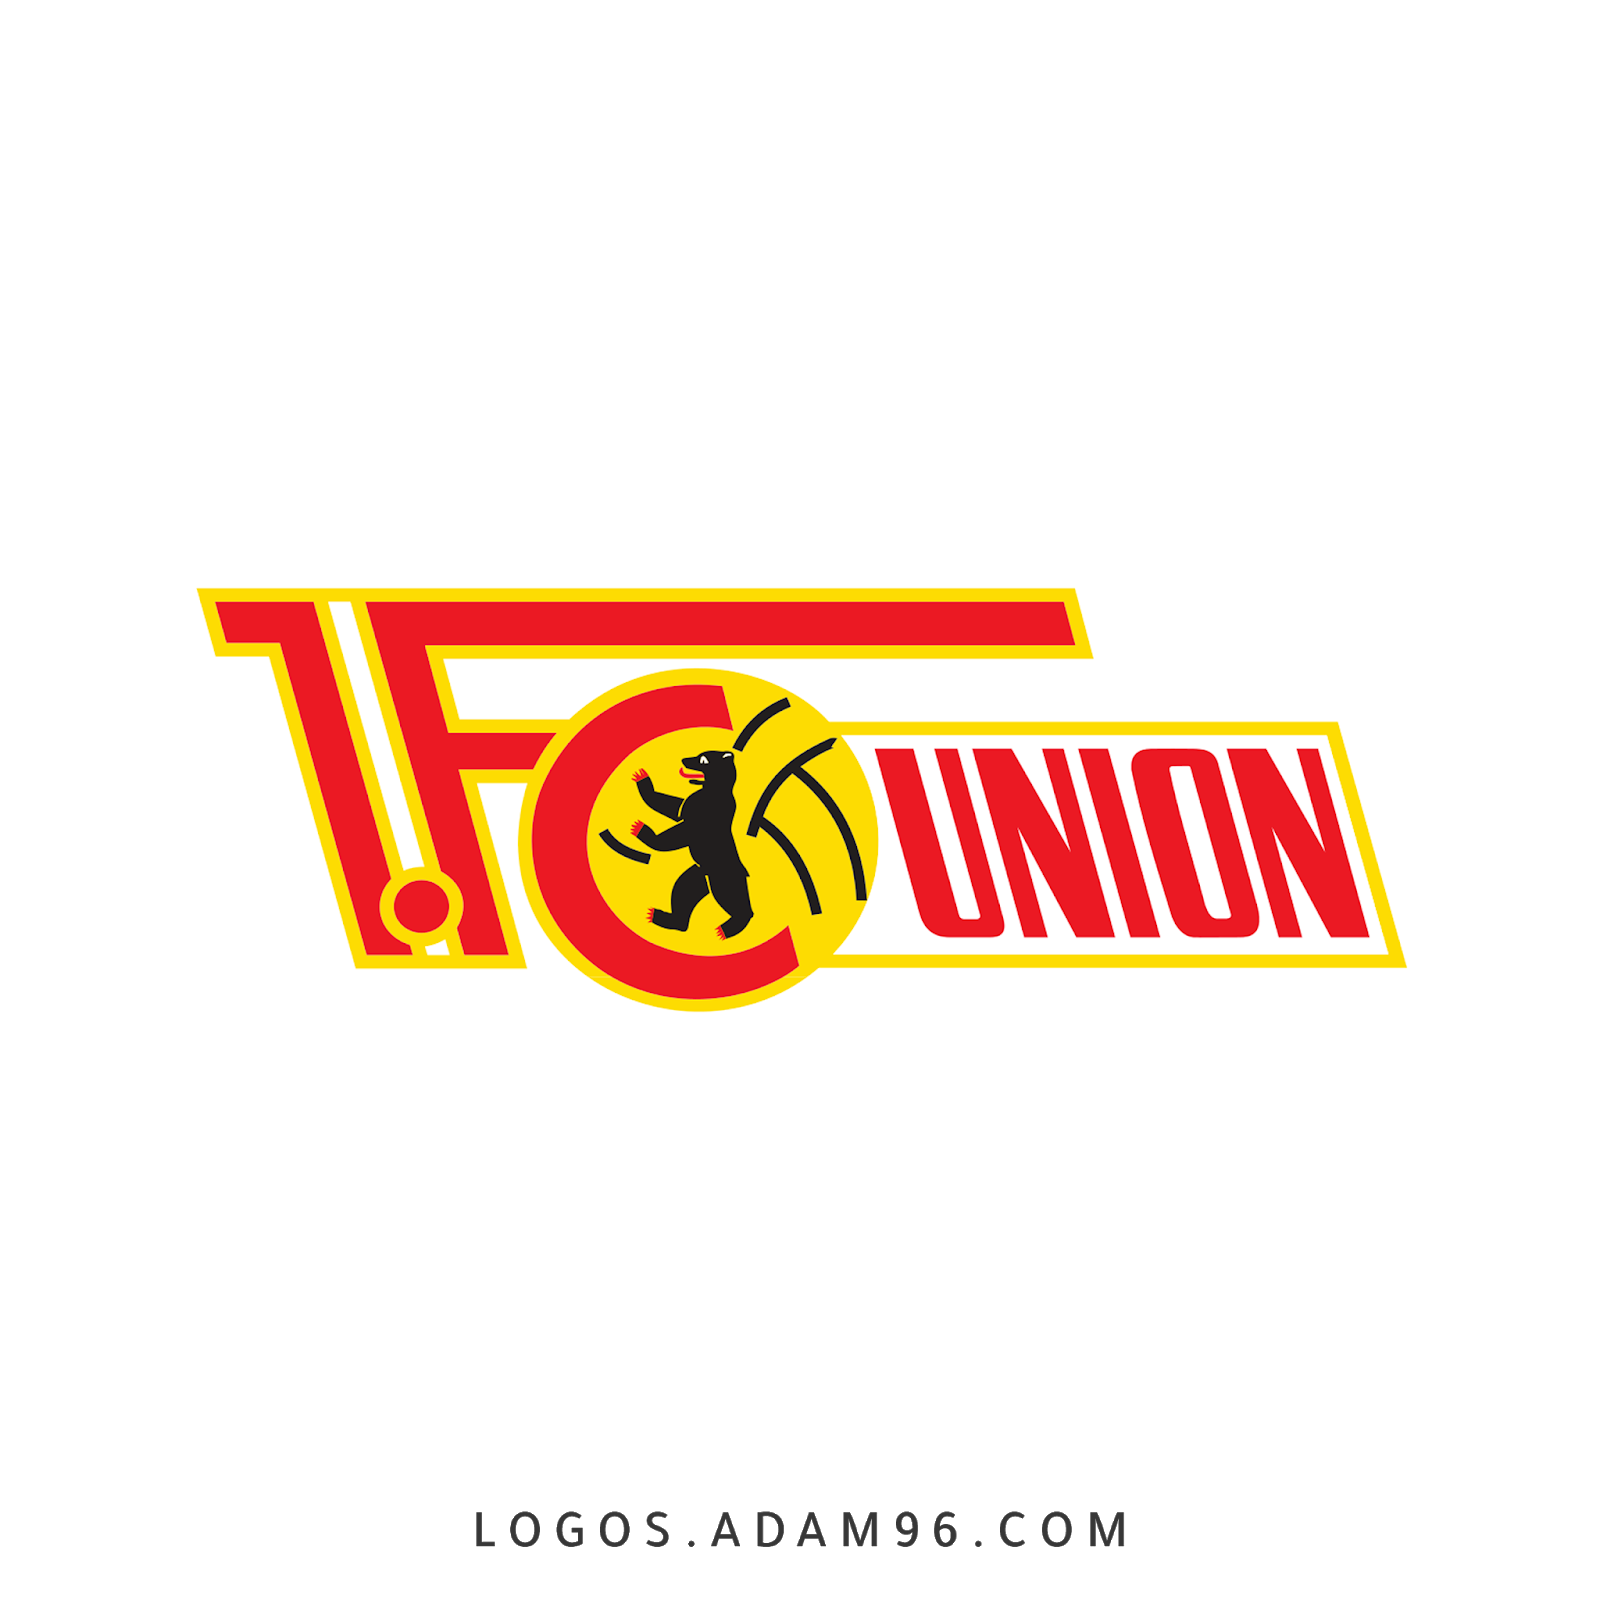 Union Berlin Club Logo Original Png Download Free Vector In 2021 Union Berlin Berlin Club Berlin